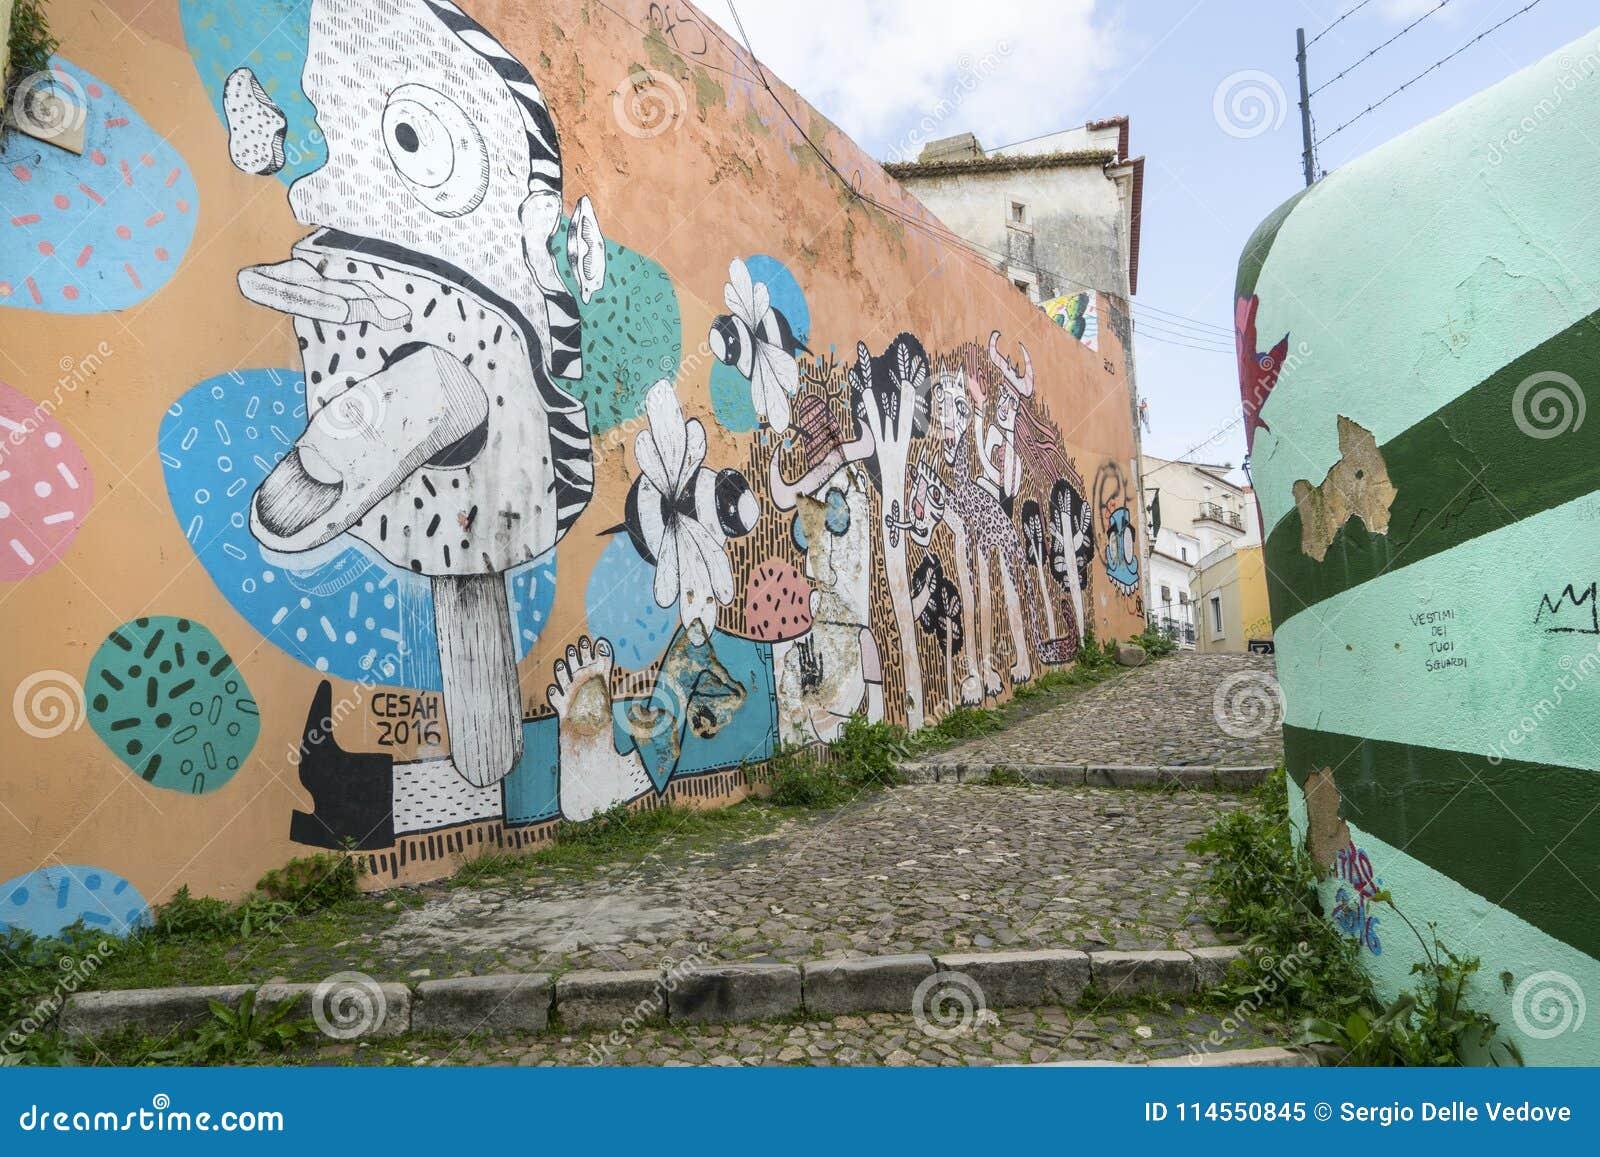 Murales En Las Calles En Lisboa Imagen Editorial Imagen De Modelo